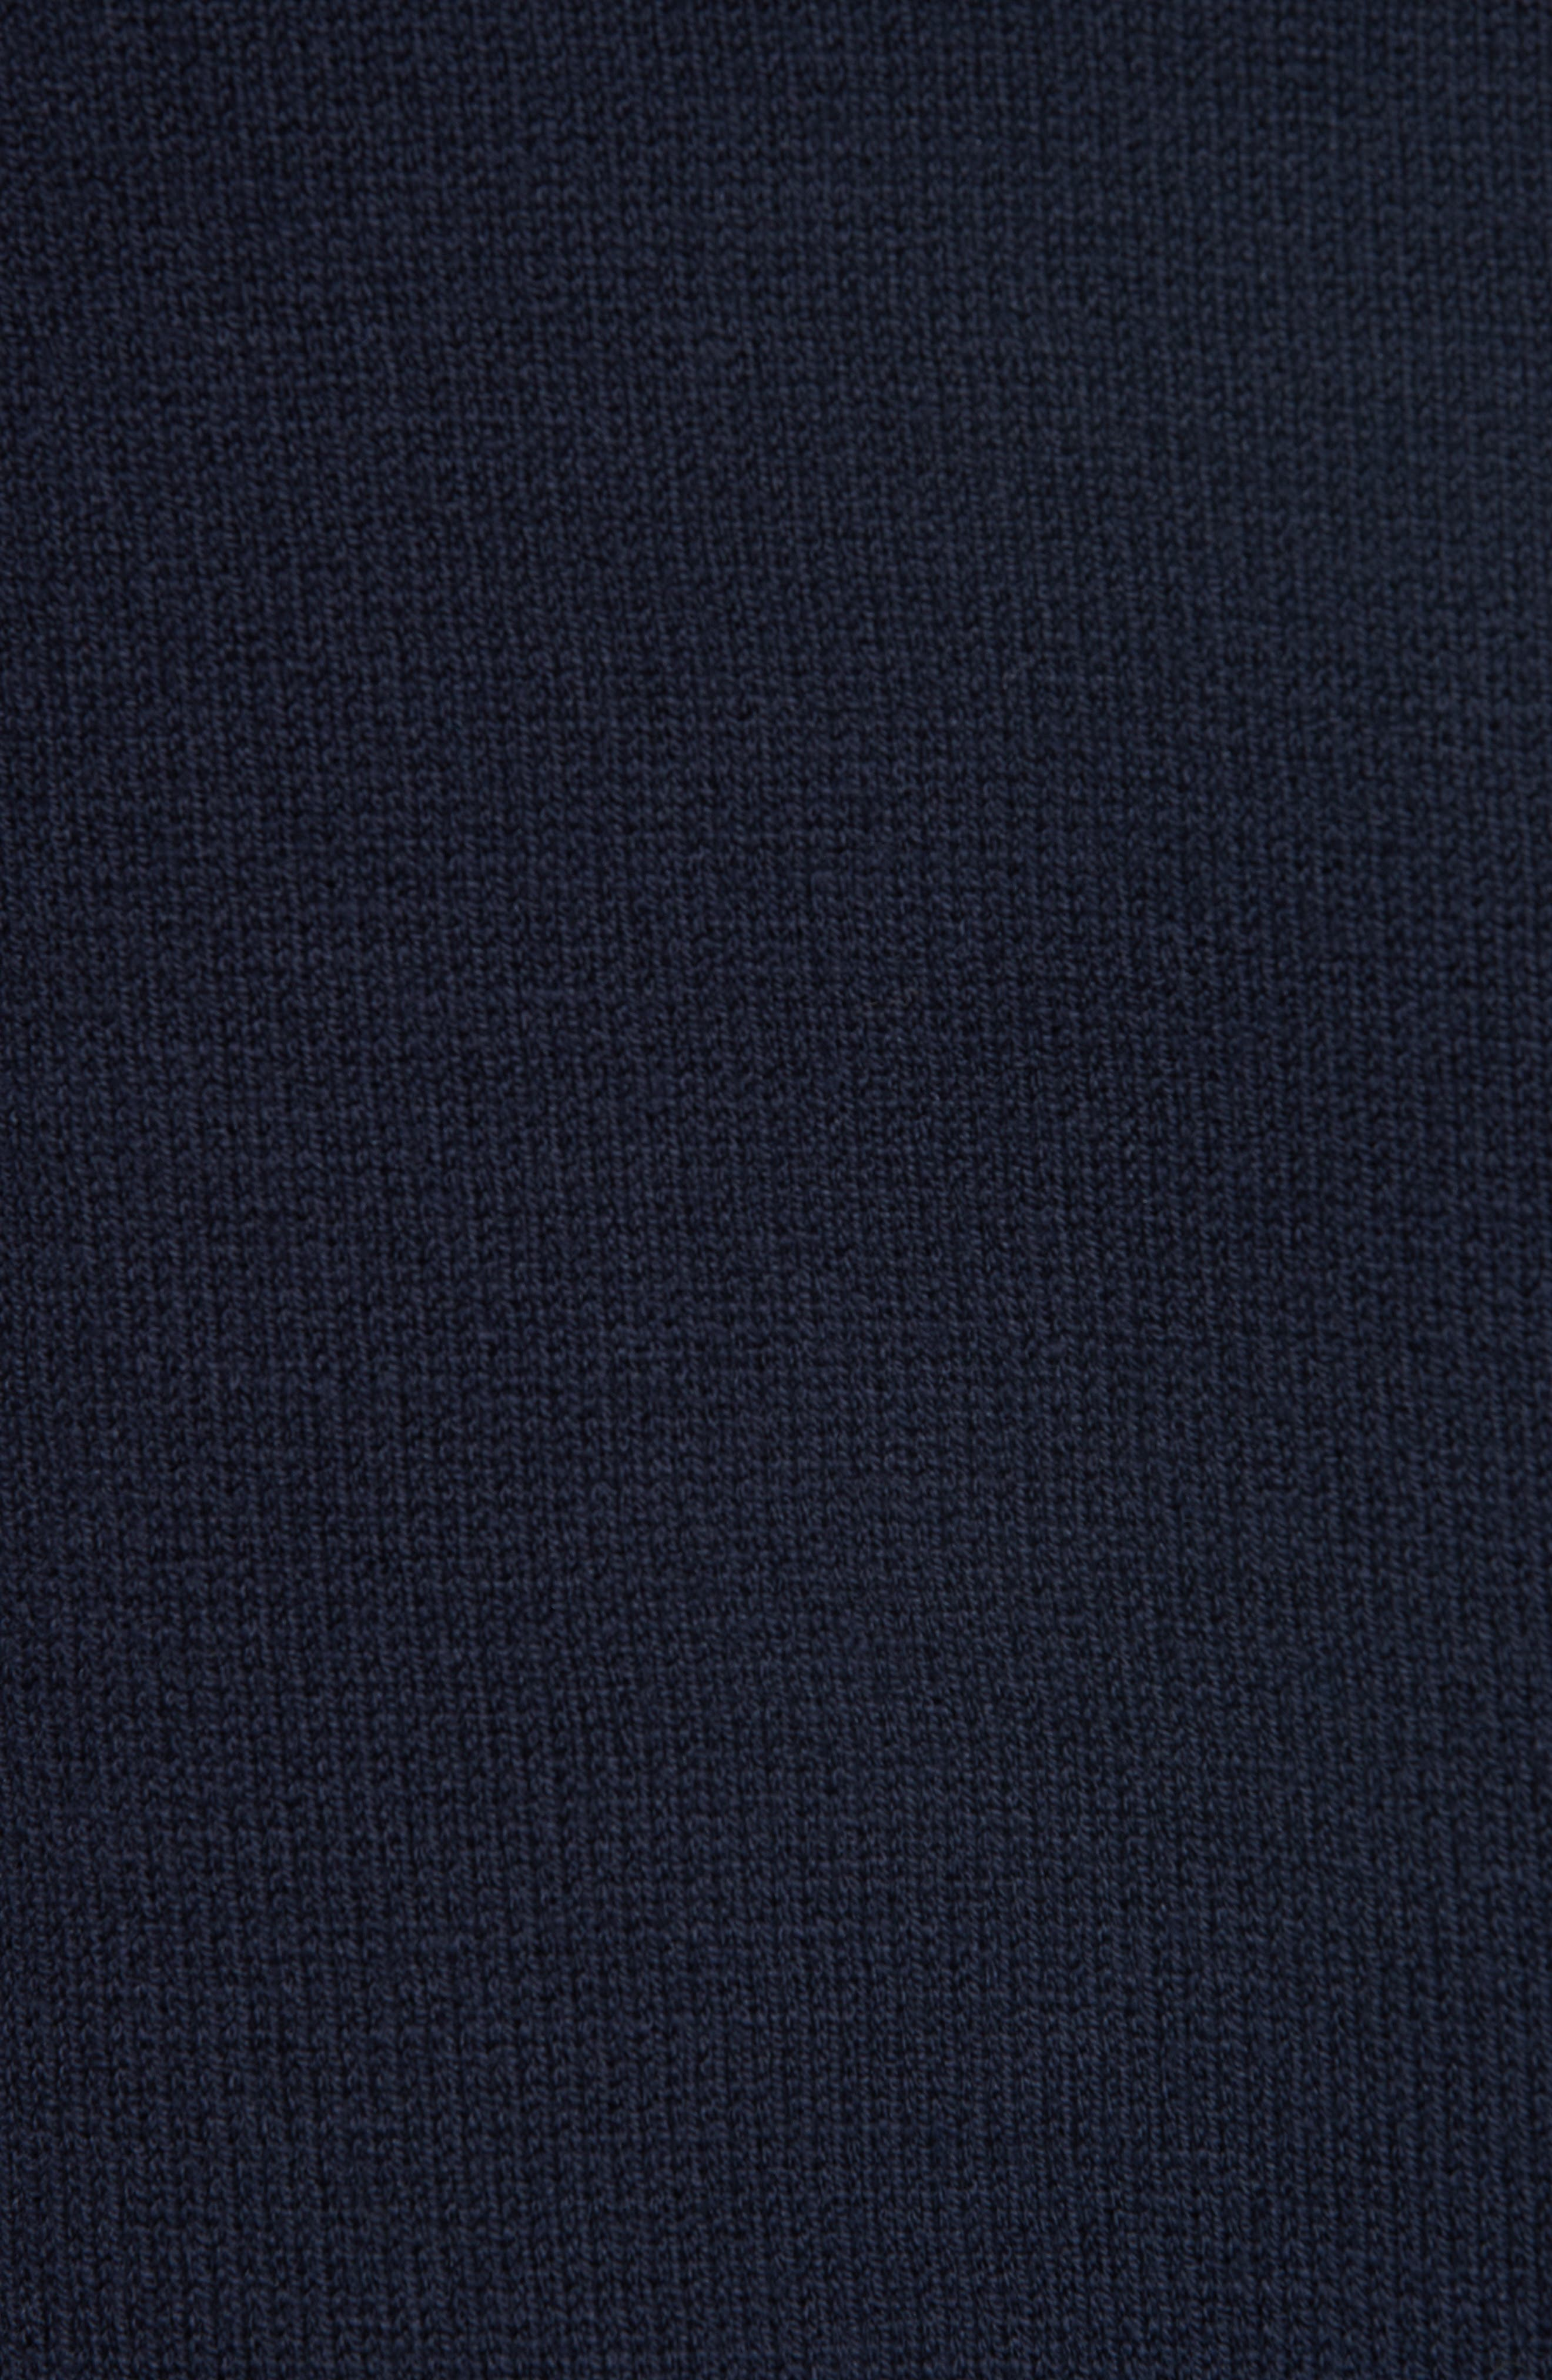 Mikhos Half Zip Sweater,                             Alternate thumbnail 5, color,                             NAVY